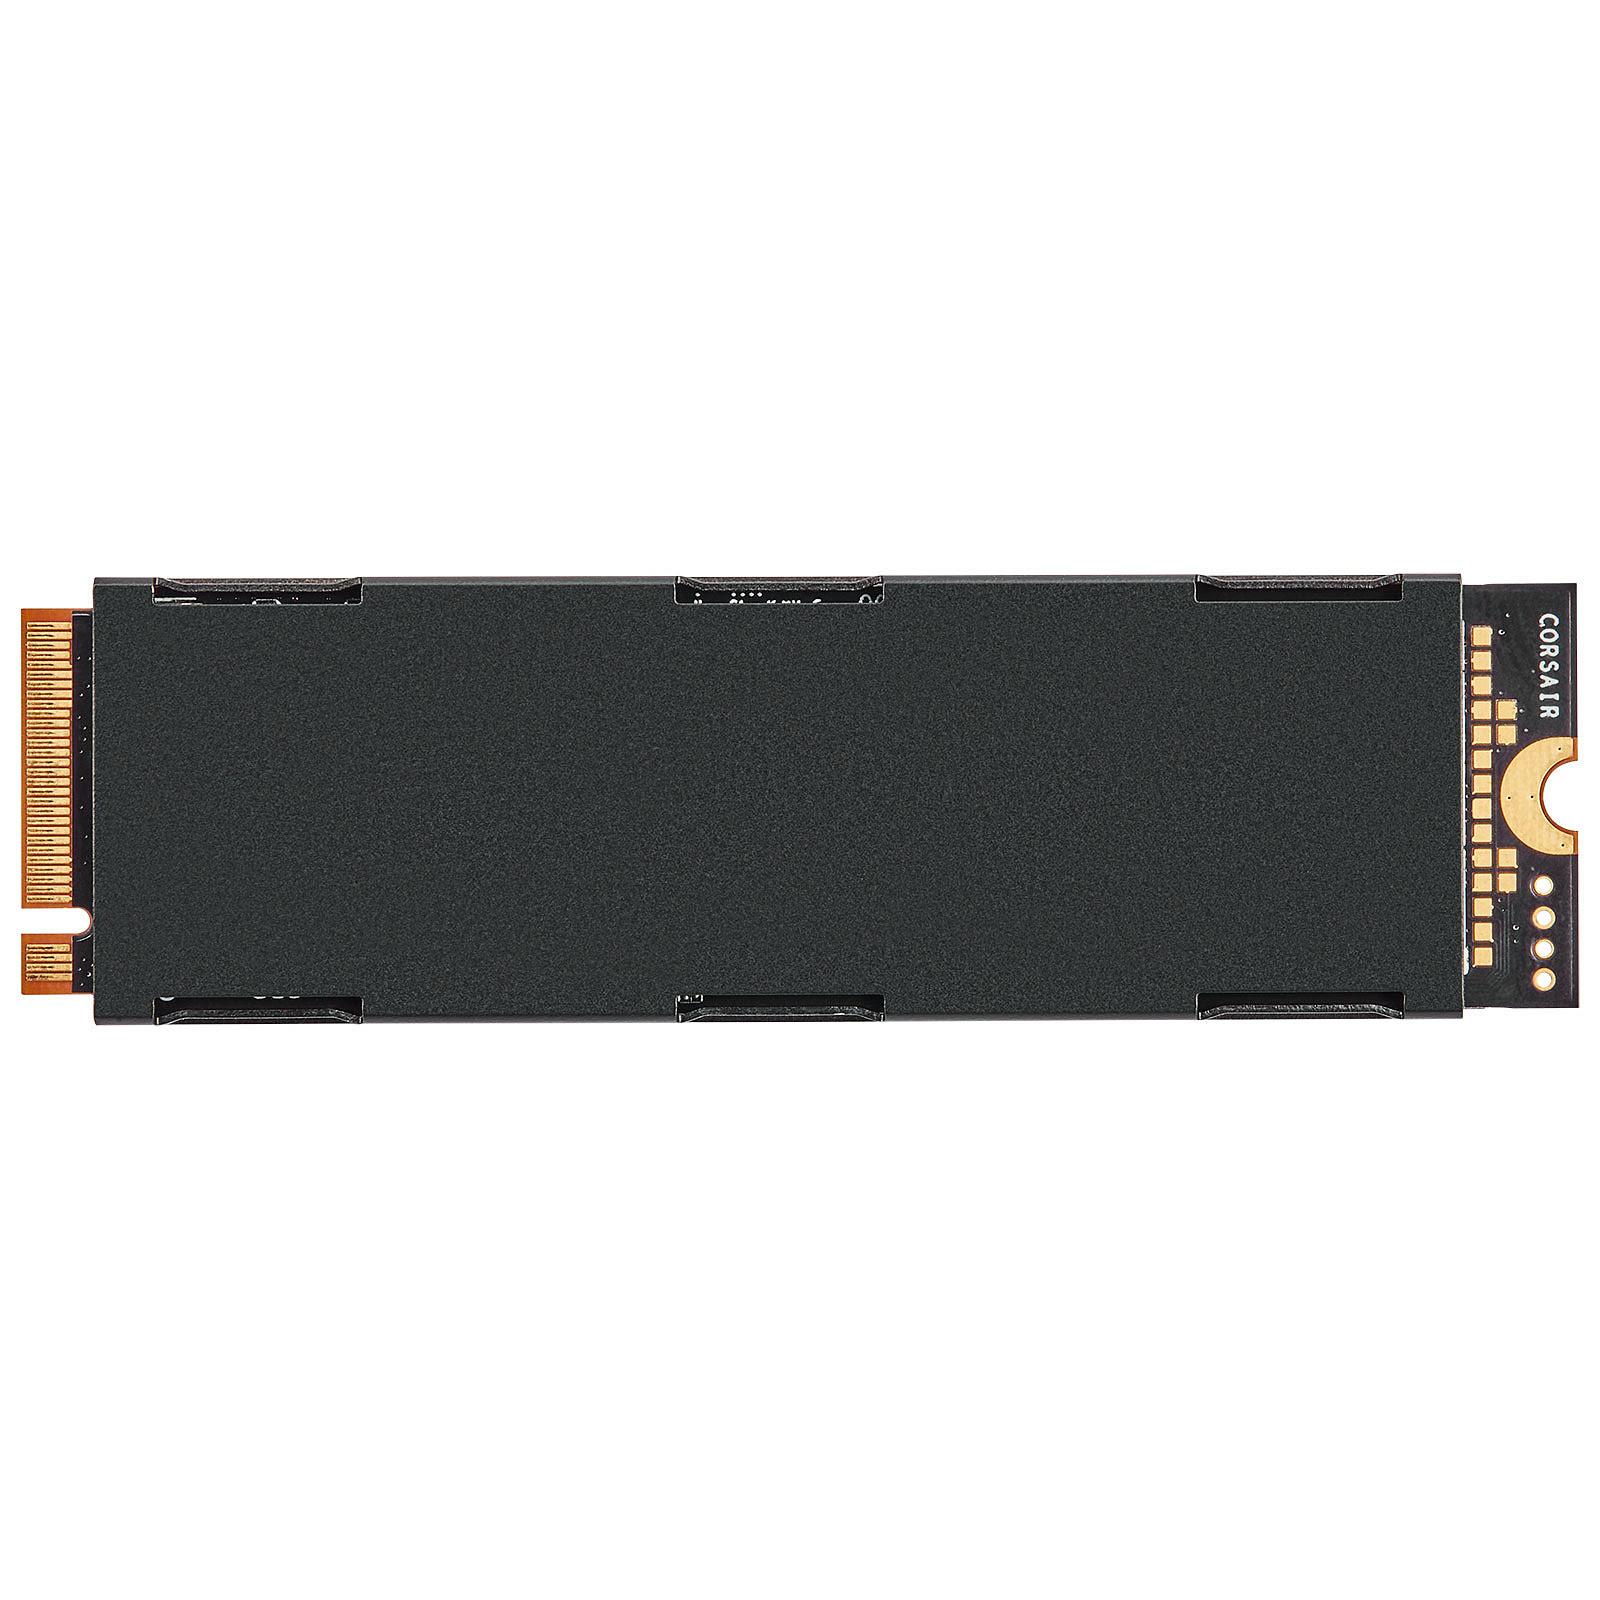 2To M.2 NVMe Gen4 - CSSD-F2000GBMP600 (CSSD-F2000GBMP600) - Achat / Vente Disque SSD sur Picata.fr - 1